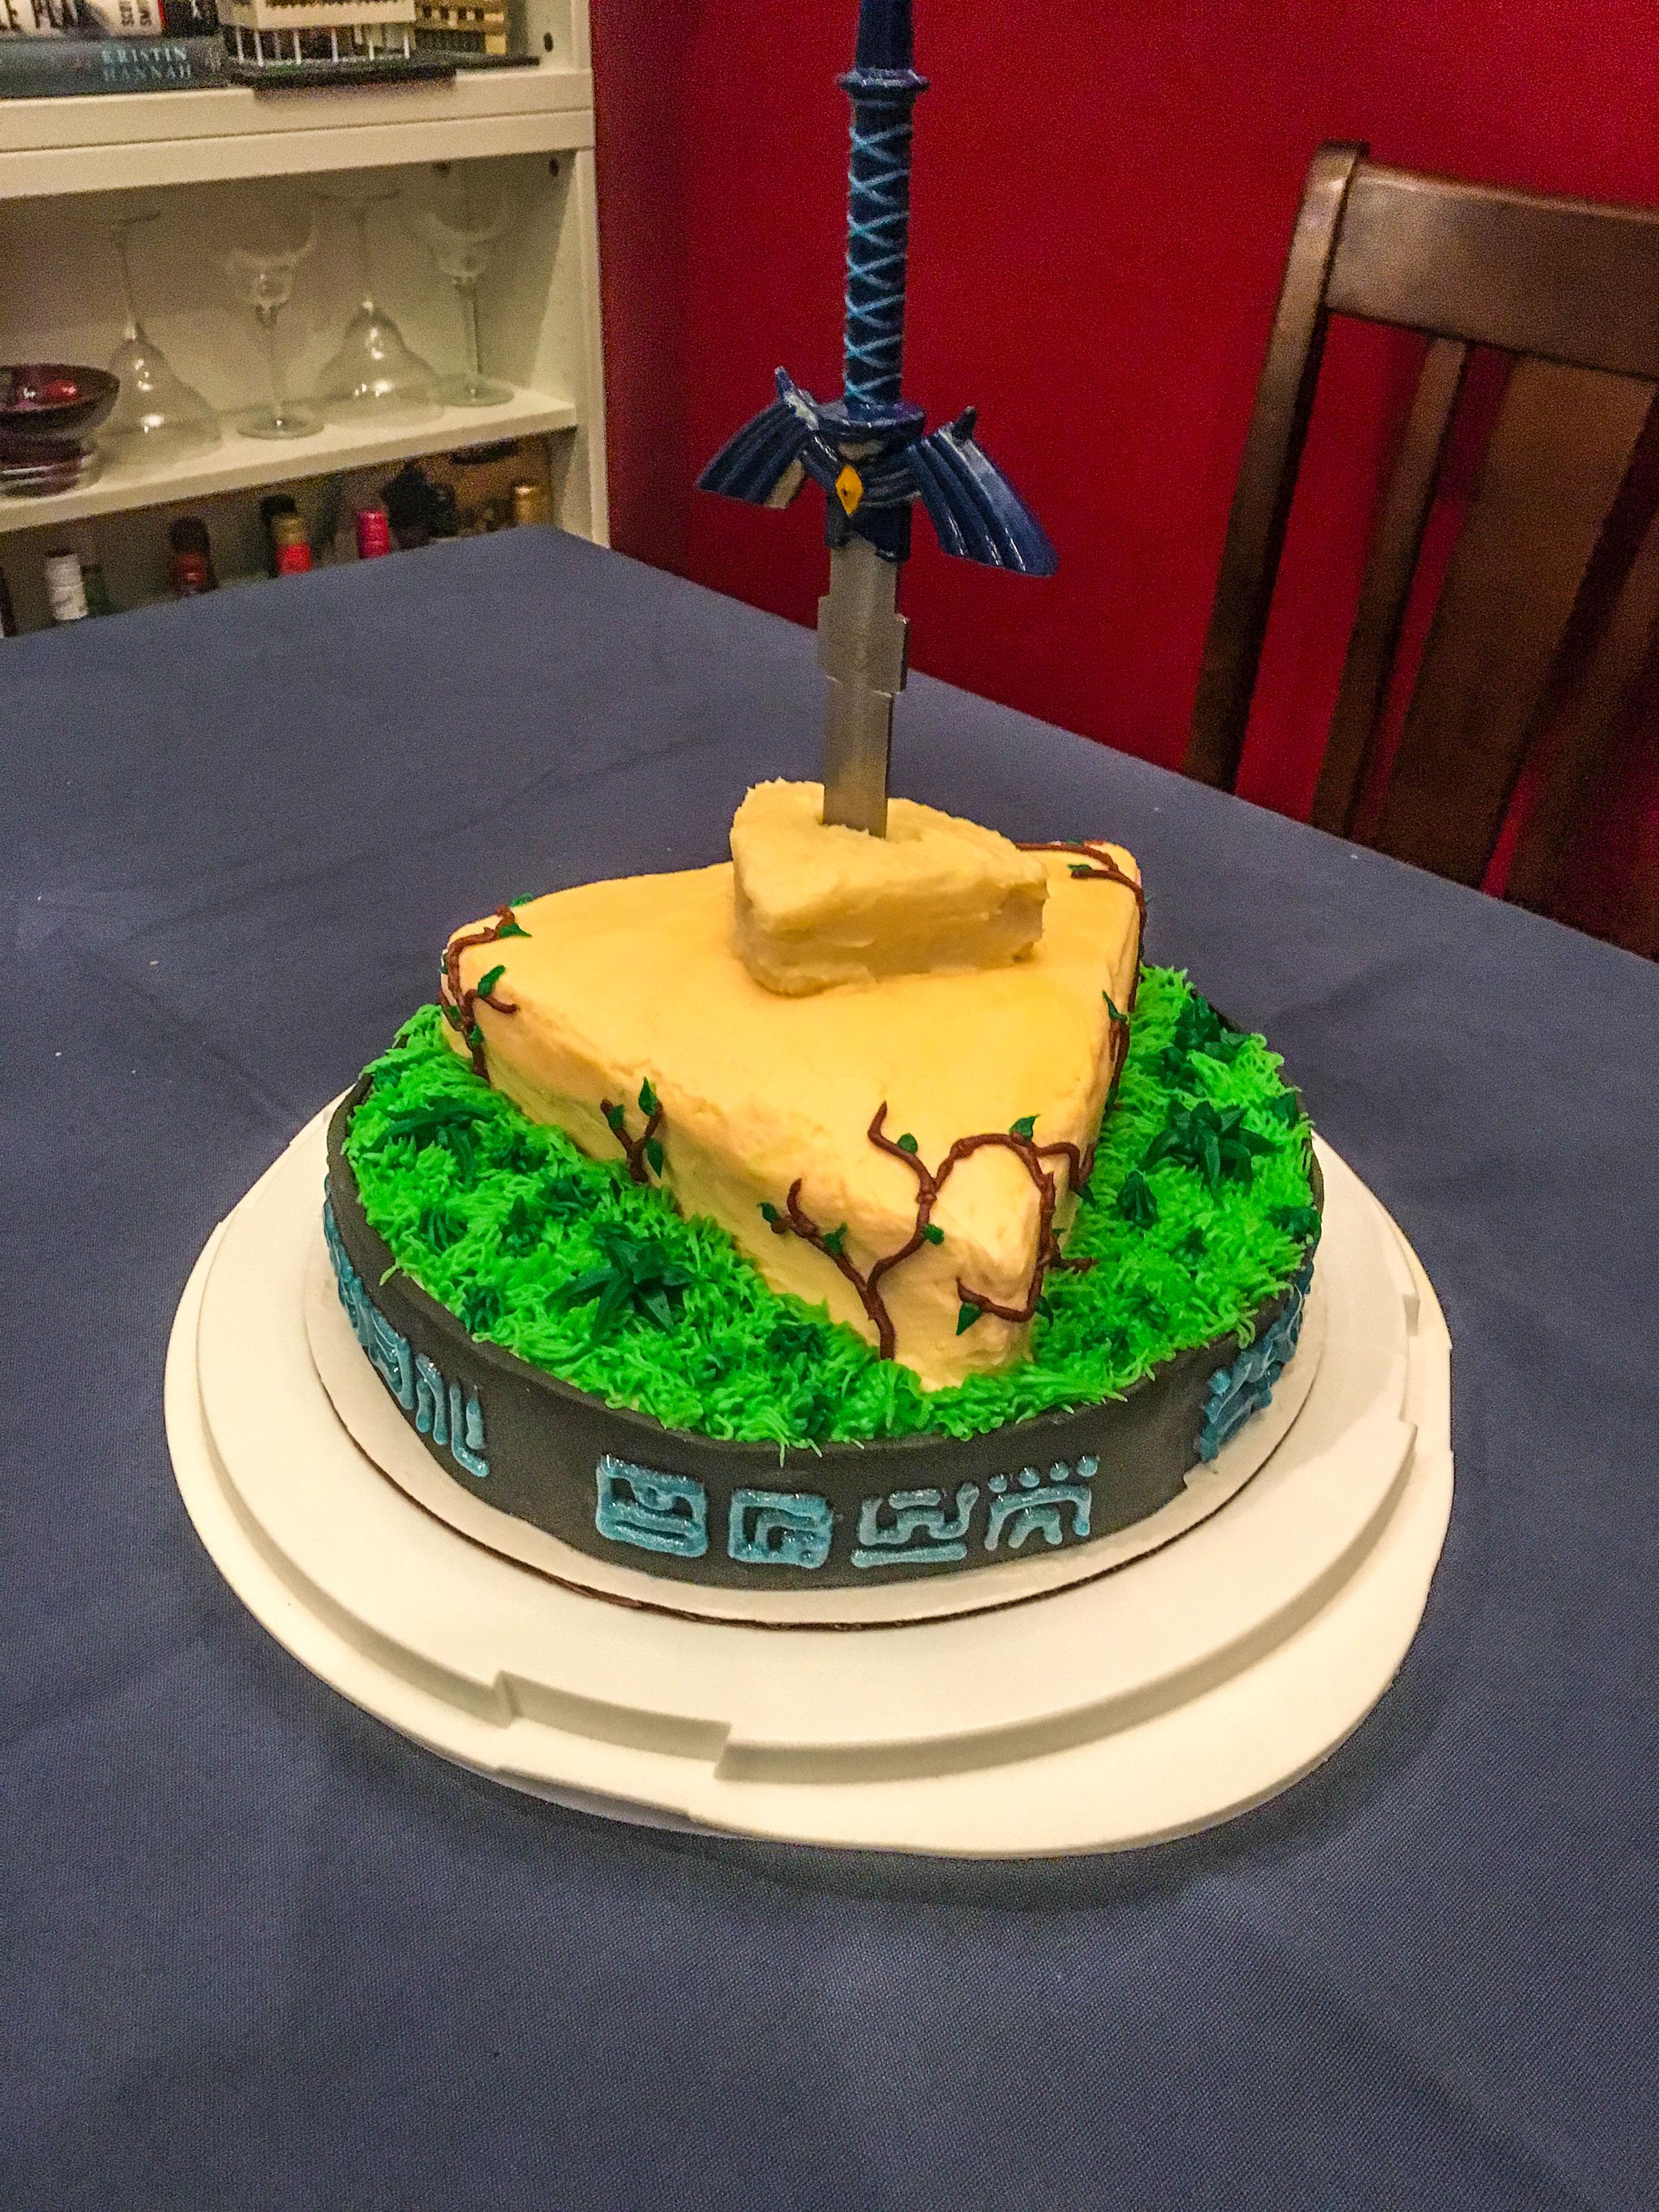 Groovy 29Th Birthday Cake Brandontouhey Com Personalised Birthday Cards Paralily Jamesorg